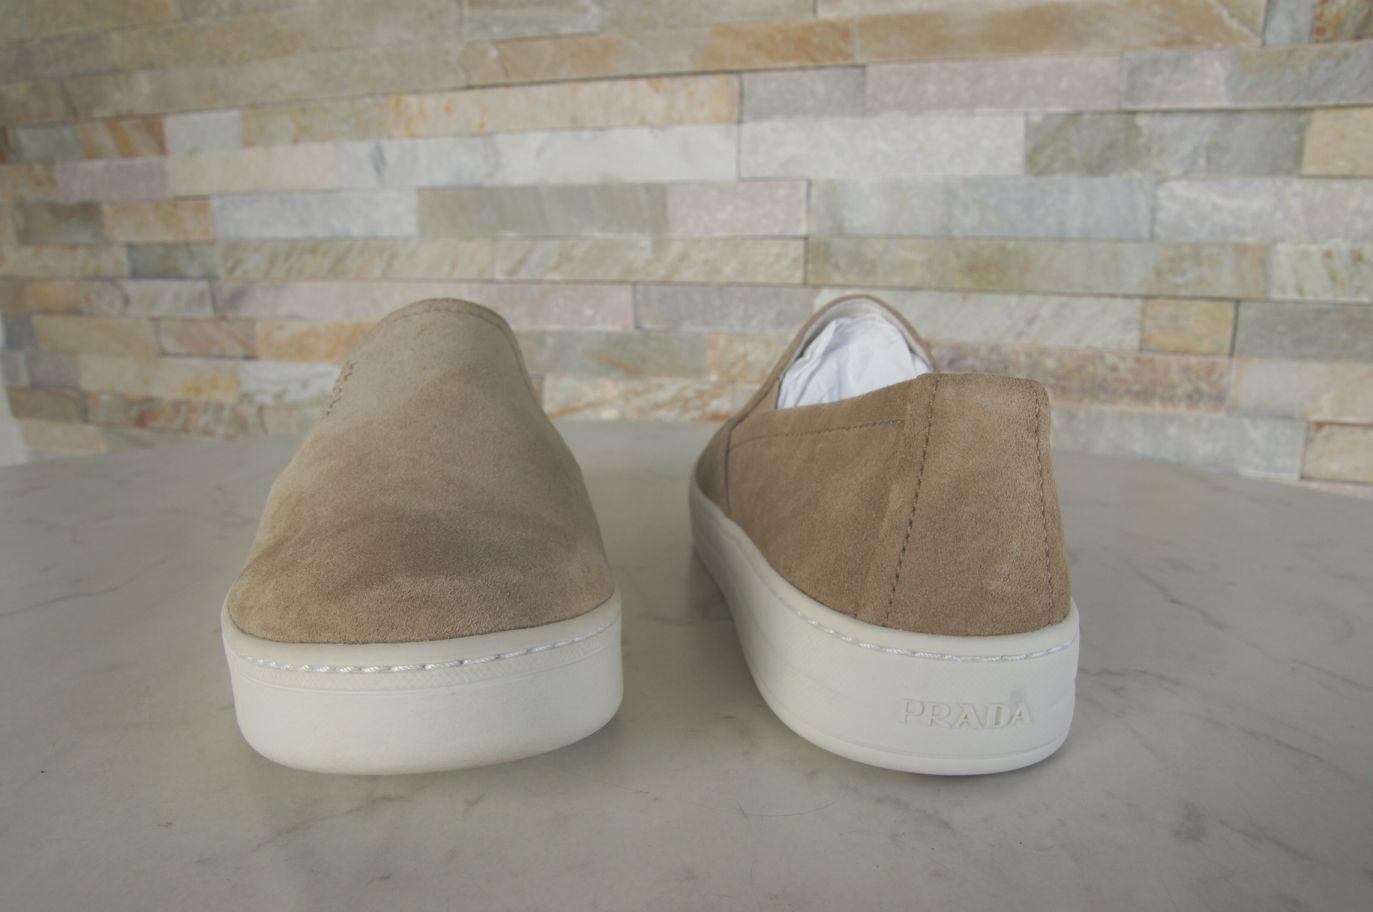 PRADA PRADA PRADA Gr 36 Slipper Mokassins Slip-On Halbschuhe Schuhe deserto sand NEU 14a814